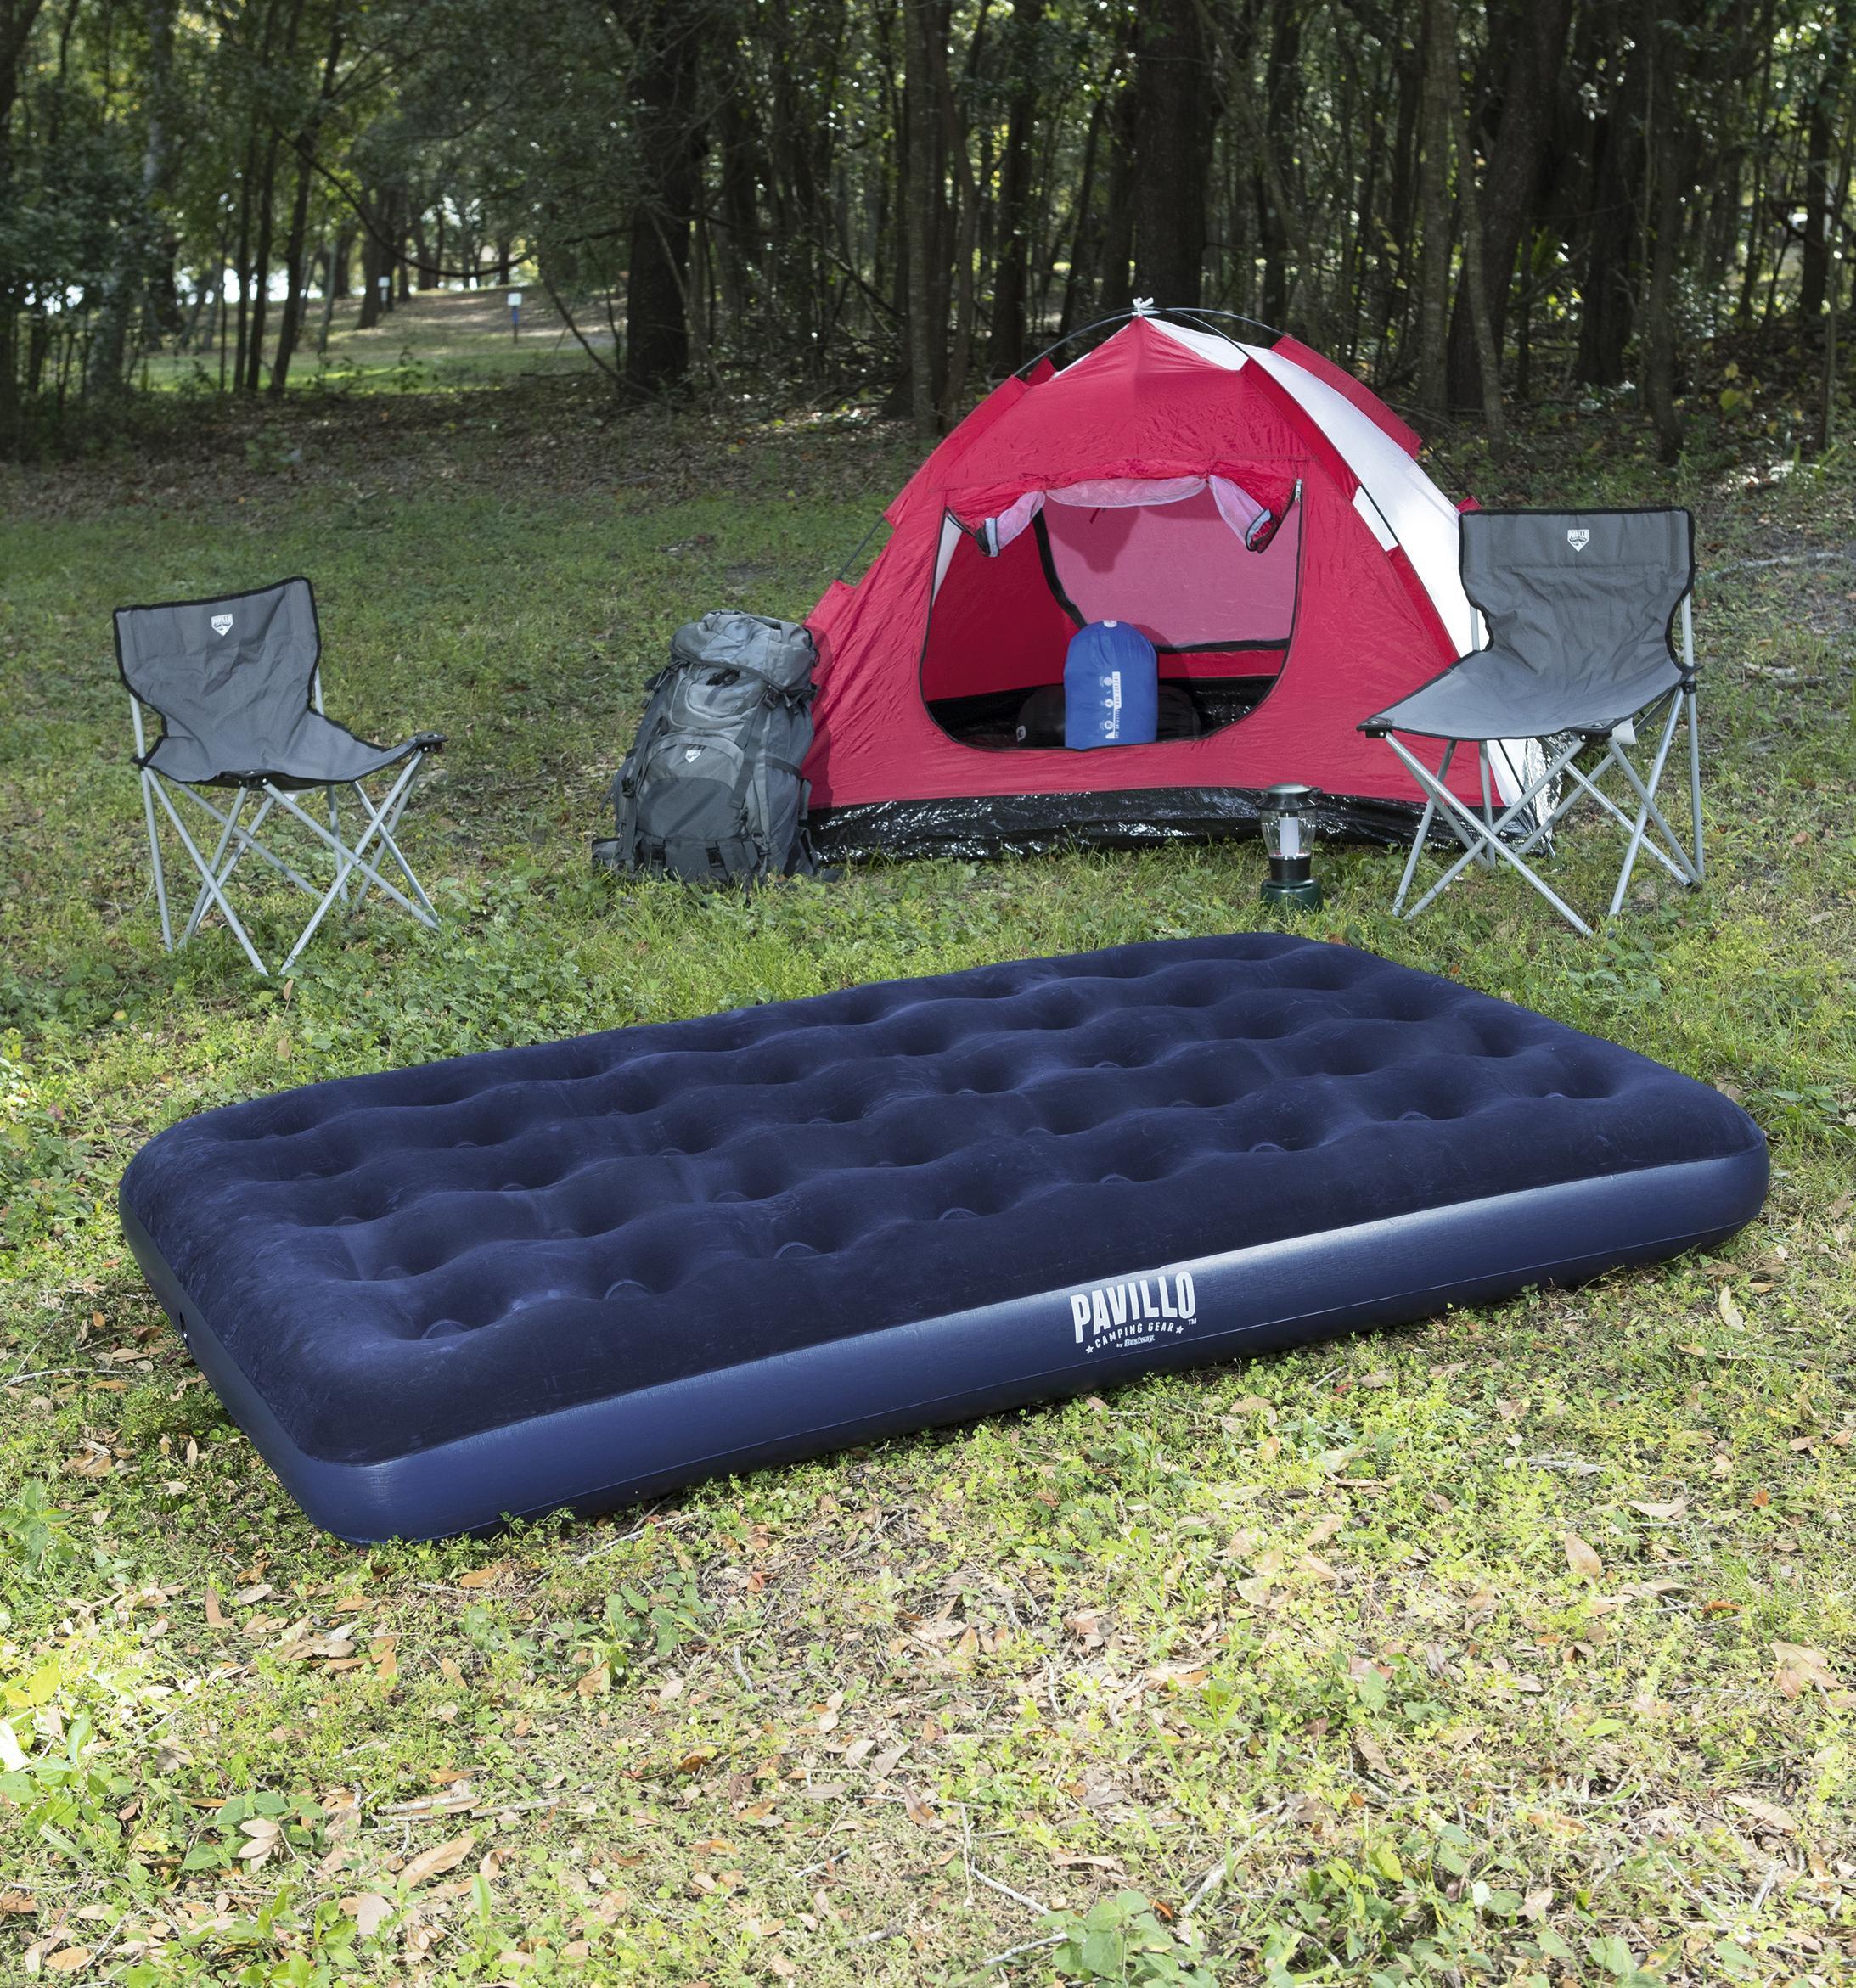 Mattress Inflatable Double флокированный 191 х137х22 Cm, Blue, Bestway, Item No. 67002